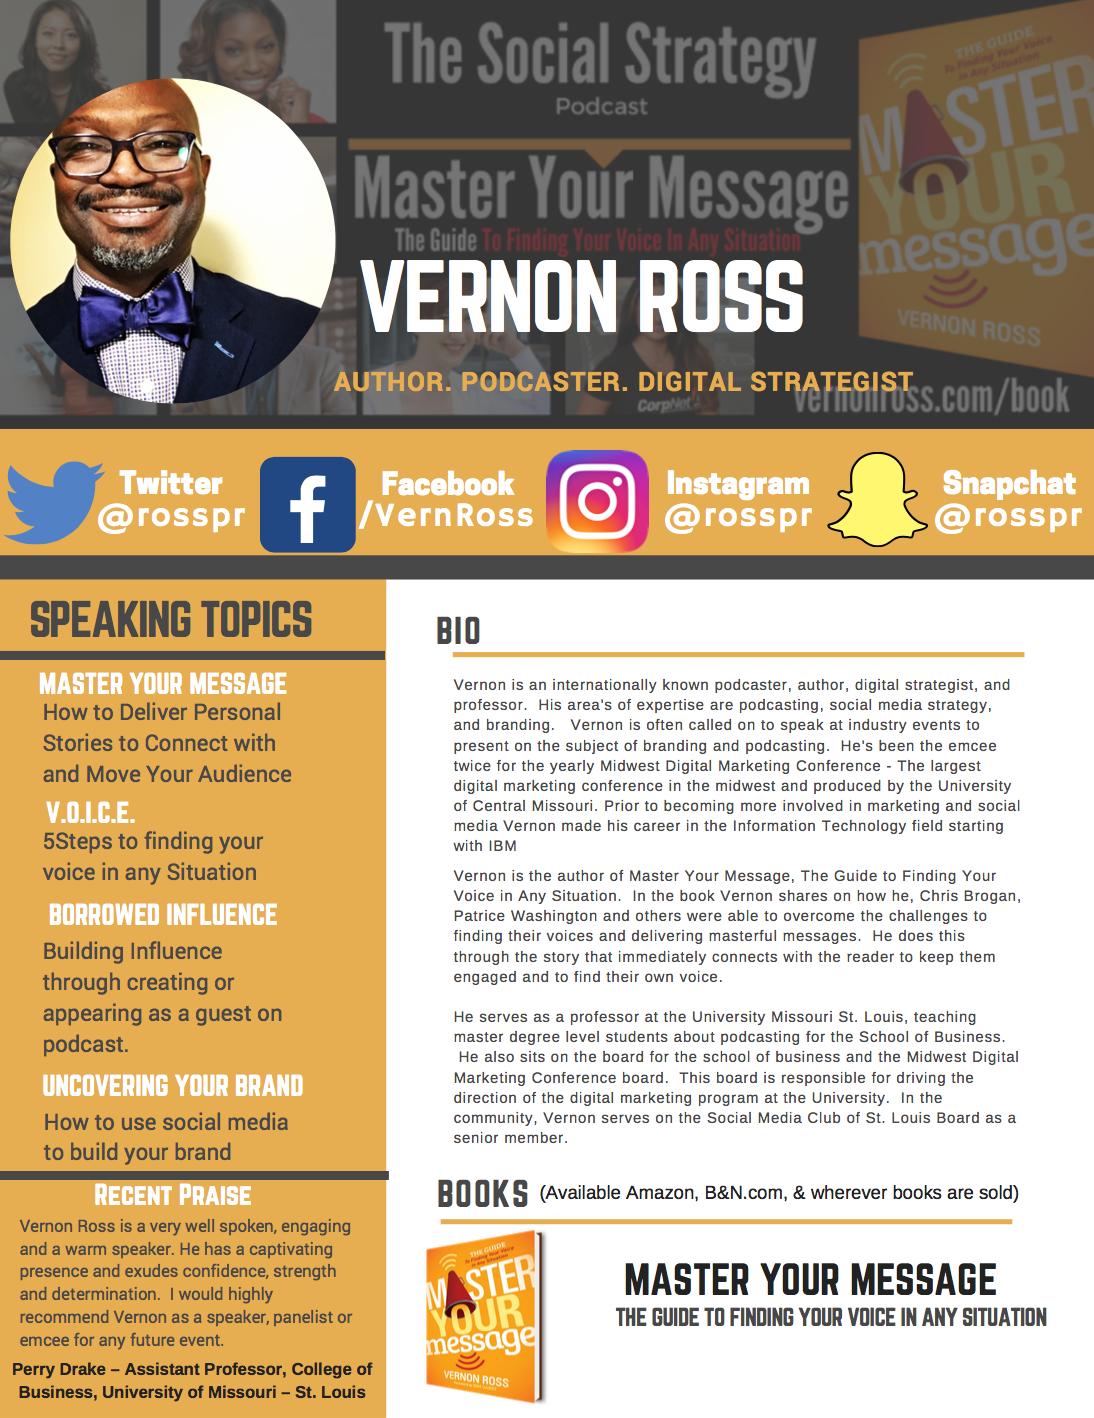 Vernon's Bio